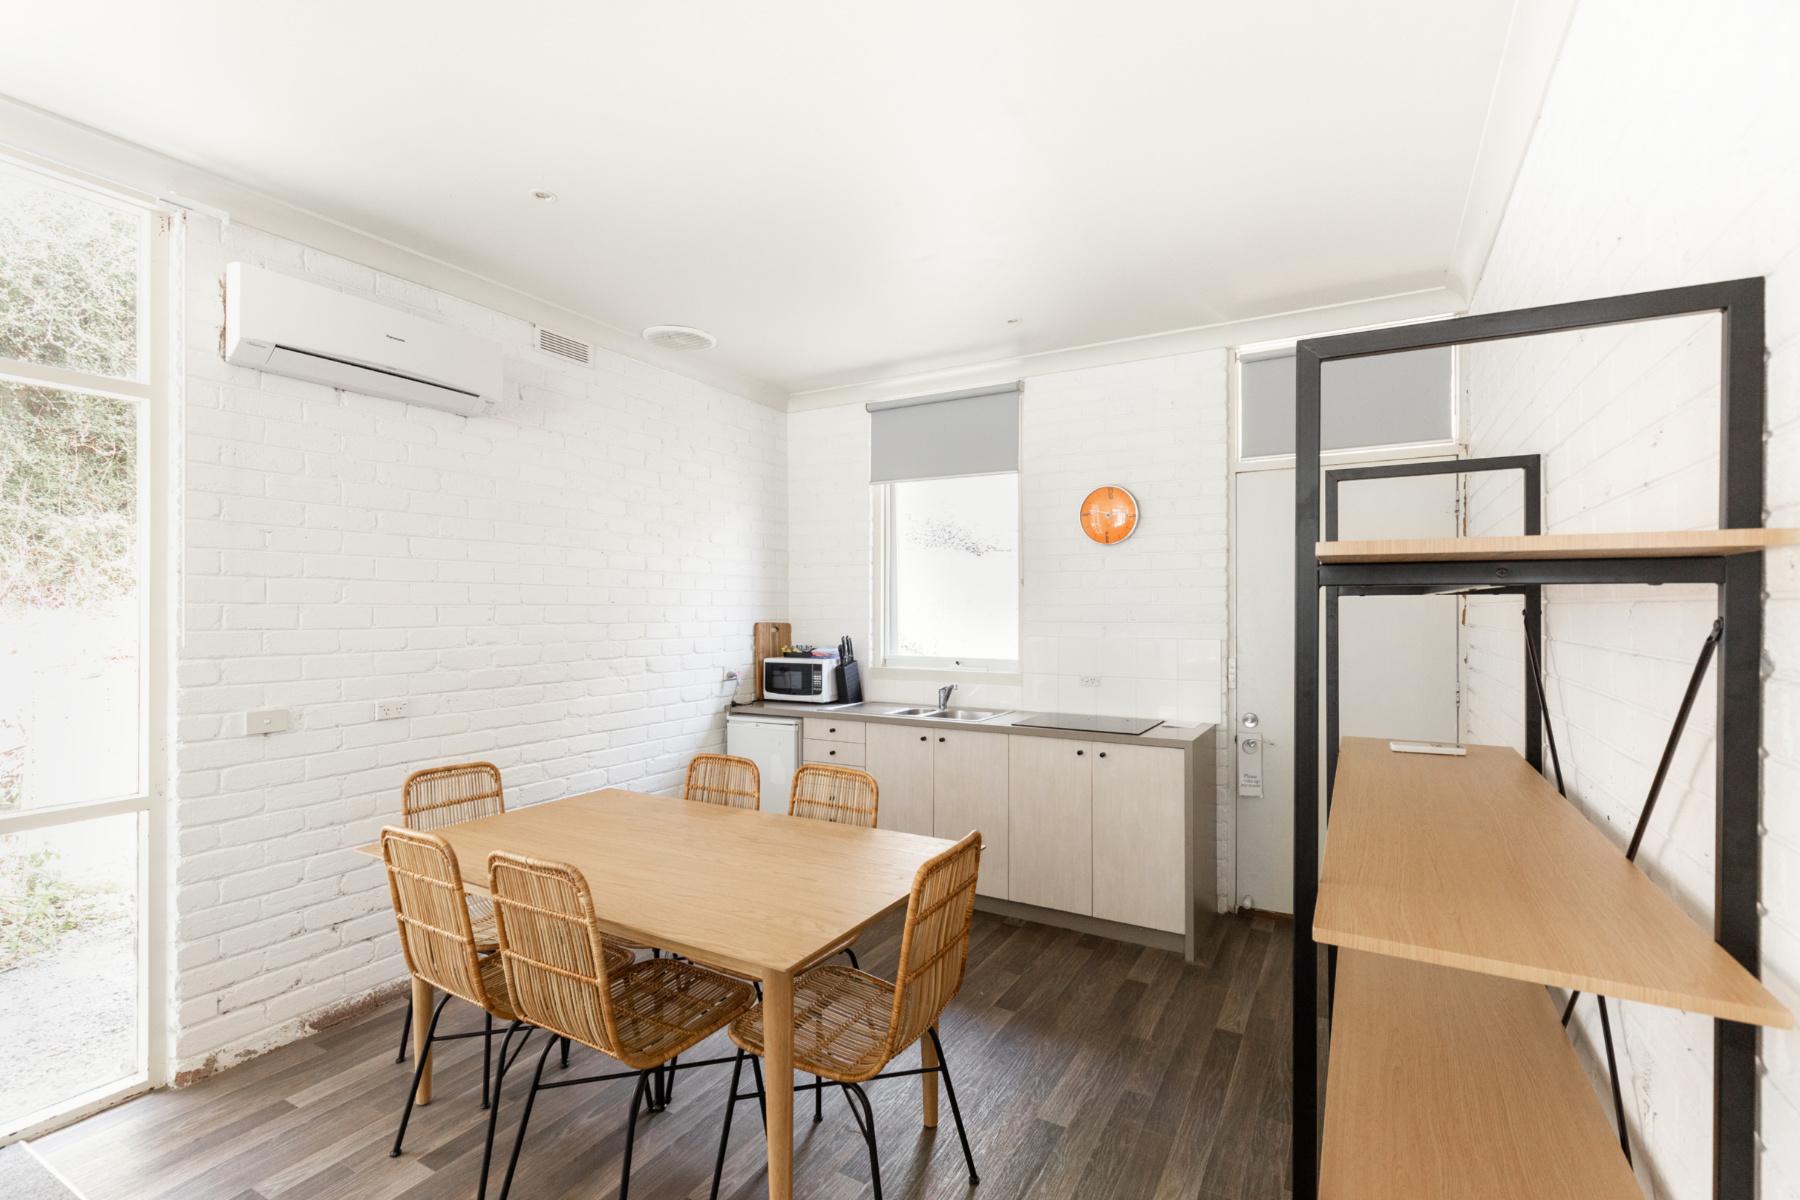 Lorne_Hotel_unit_kitchen_landscape.jpg